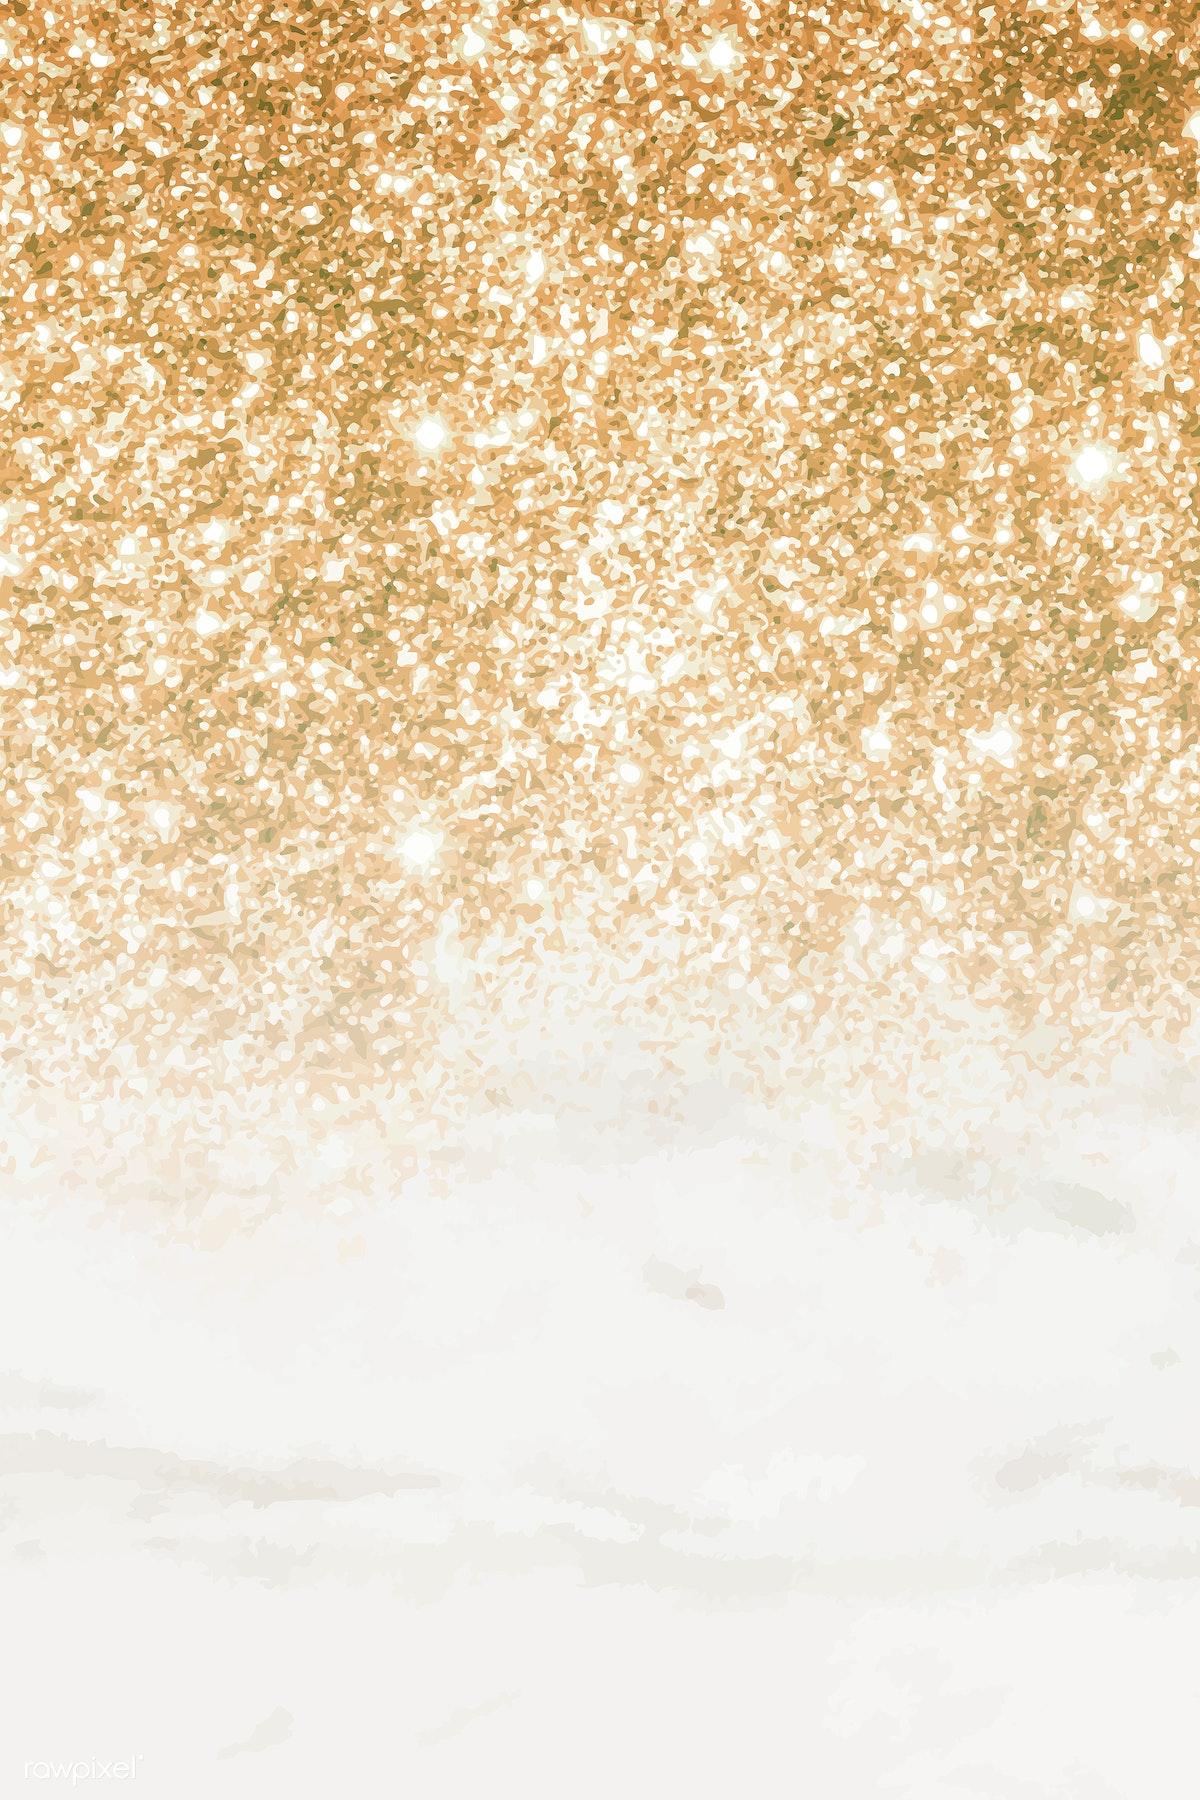 Golden glitter background   Royalty free stock vector - 938033